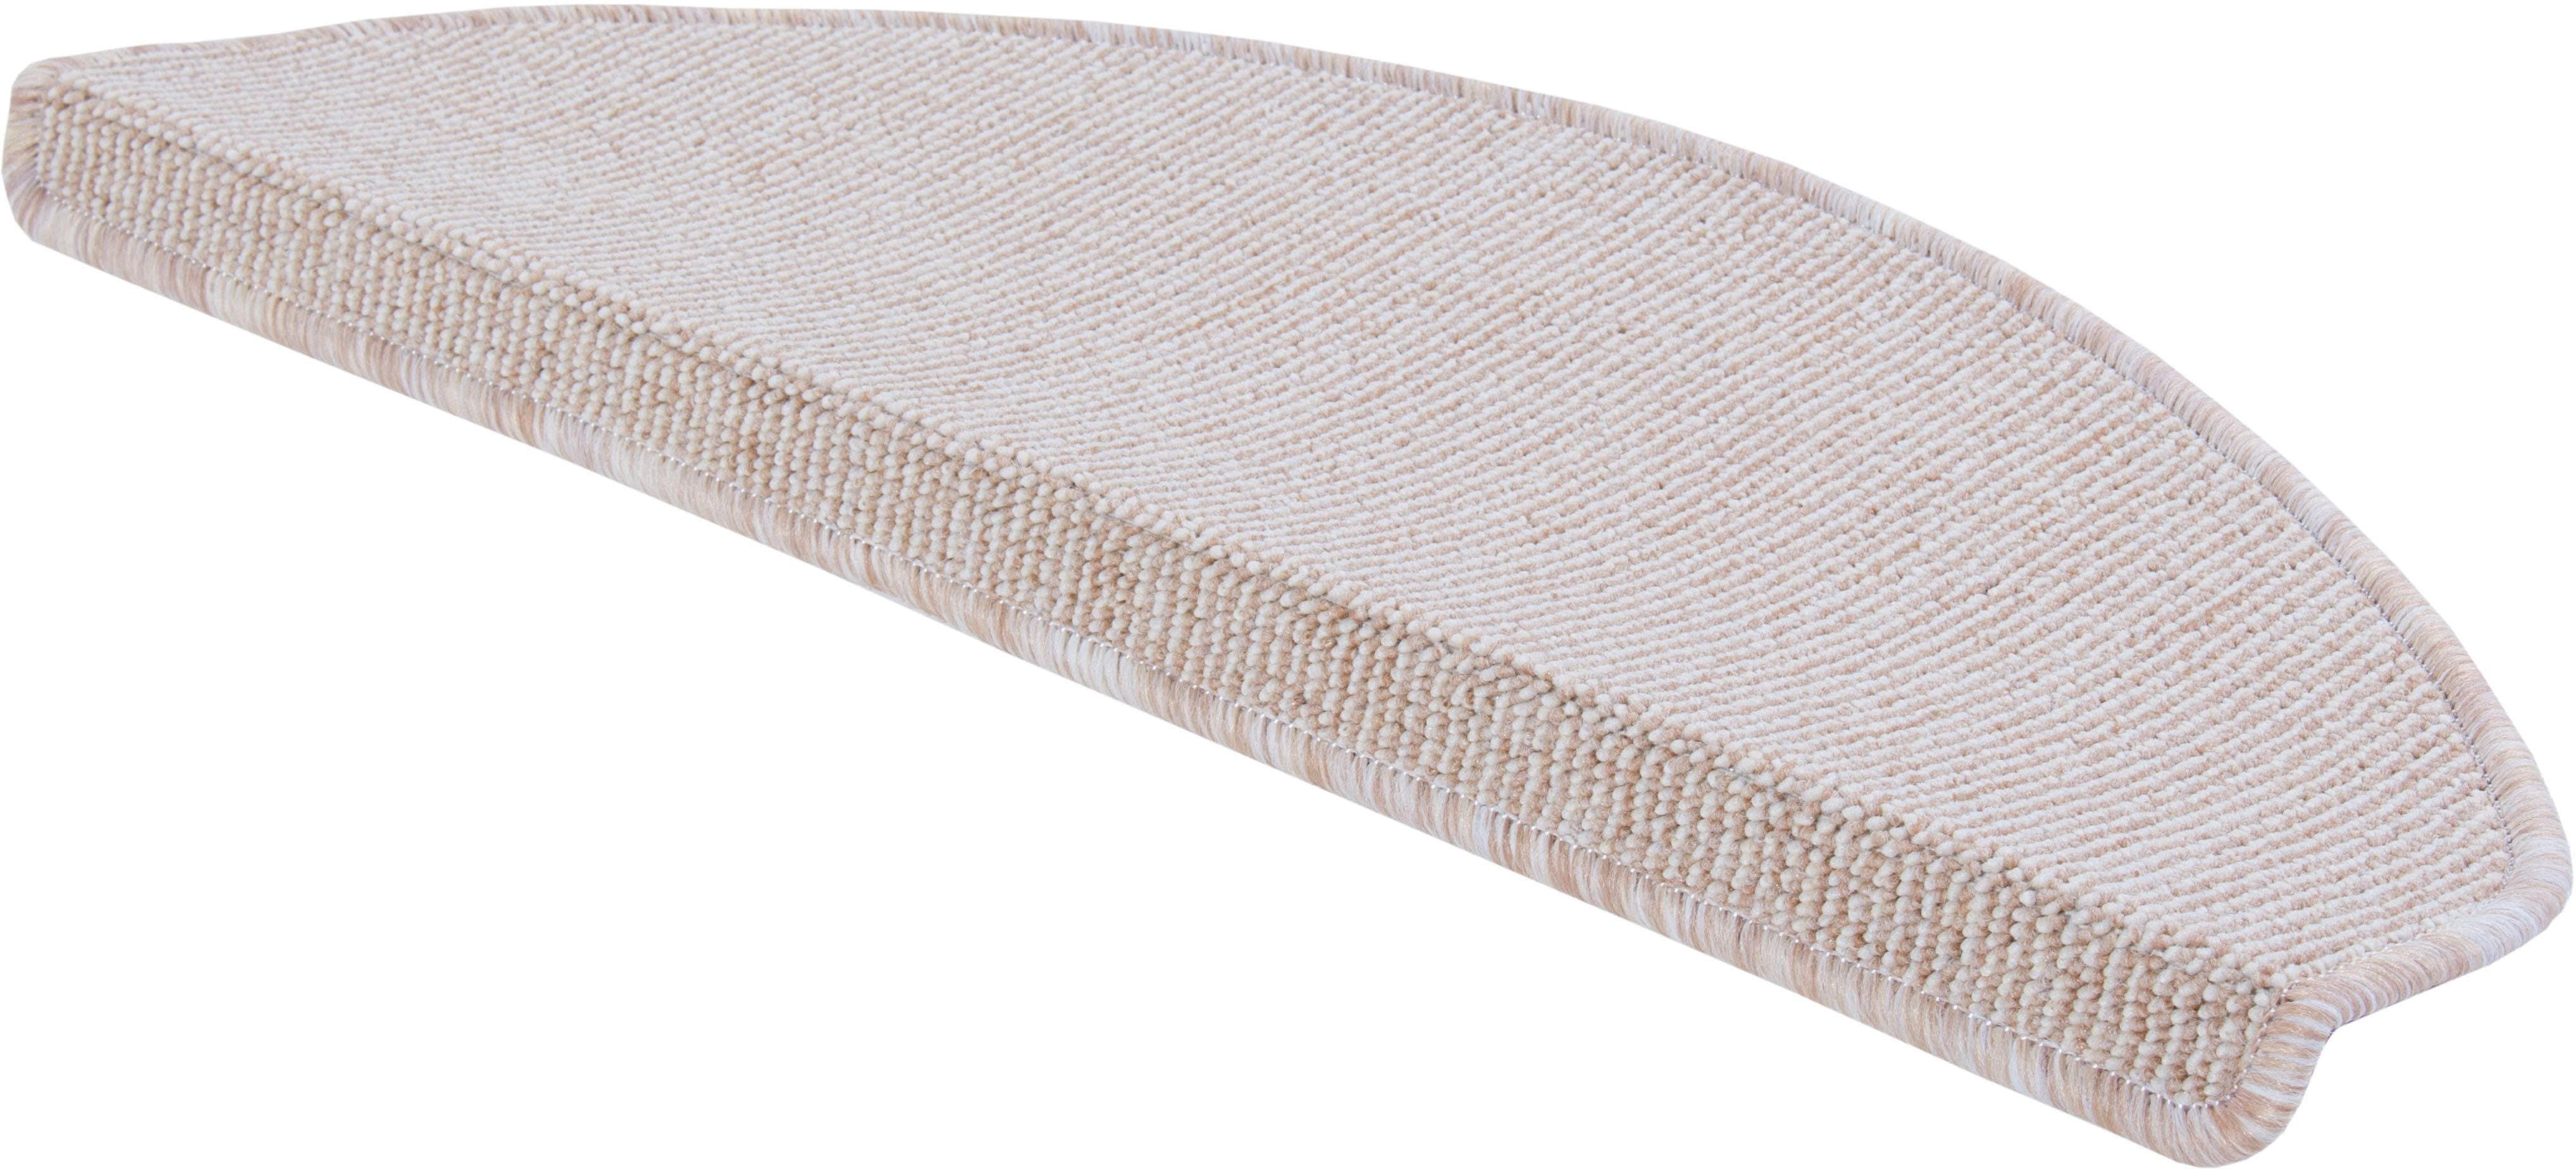 Stufenmatte Ben Andiamo stufenförmig Höhe 45 mm maschinell gewebt